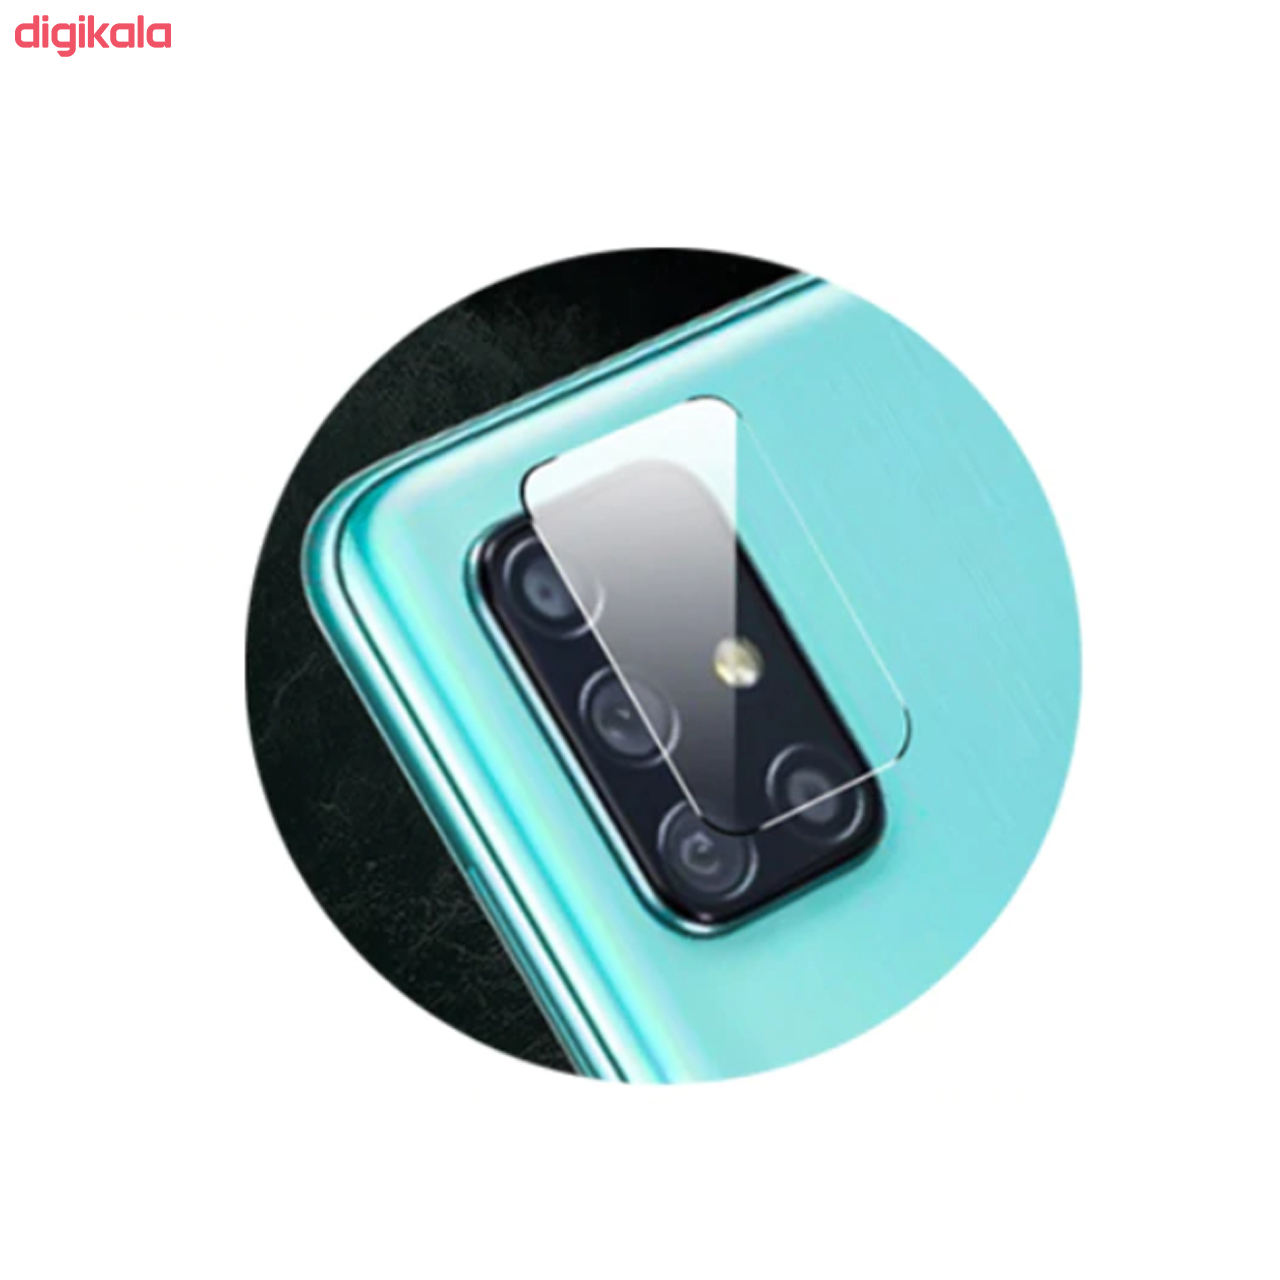 محافظ لنز دوربین سیحان مدل GLP مناسب برای گوشی موبایل سامسونگ Galaxy A71 main 1 2